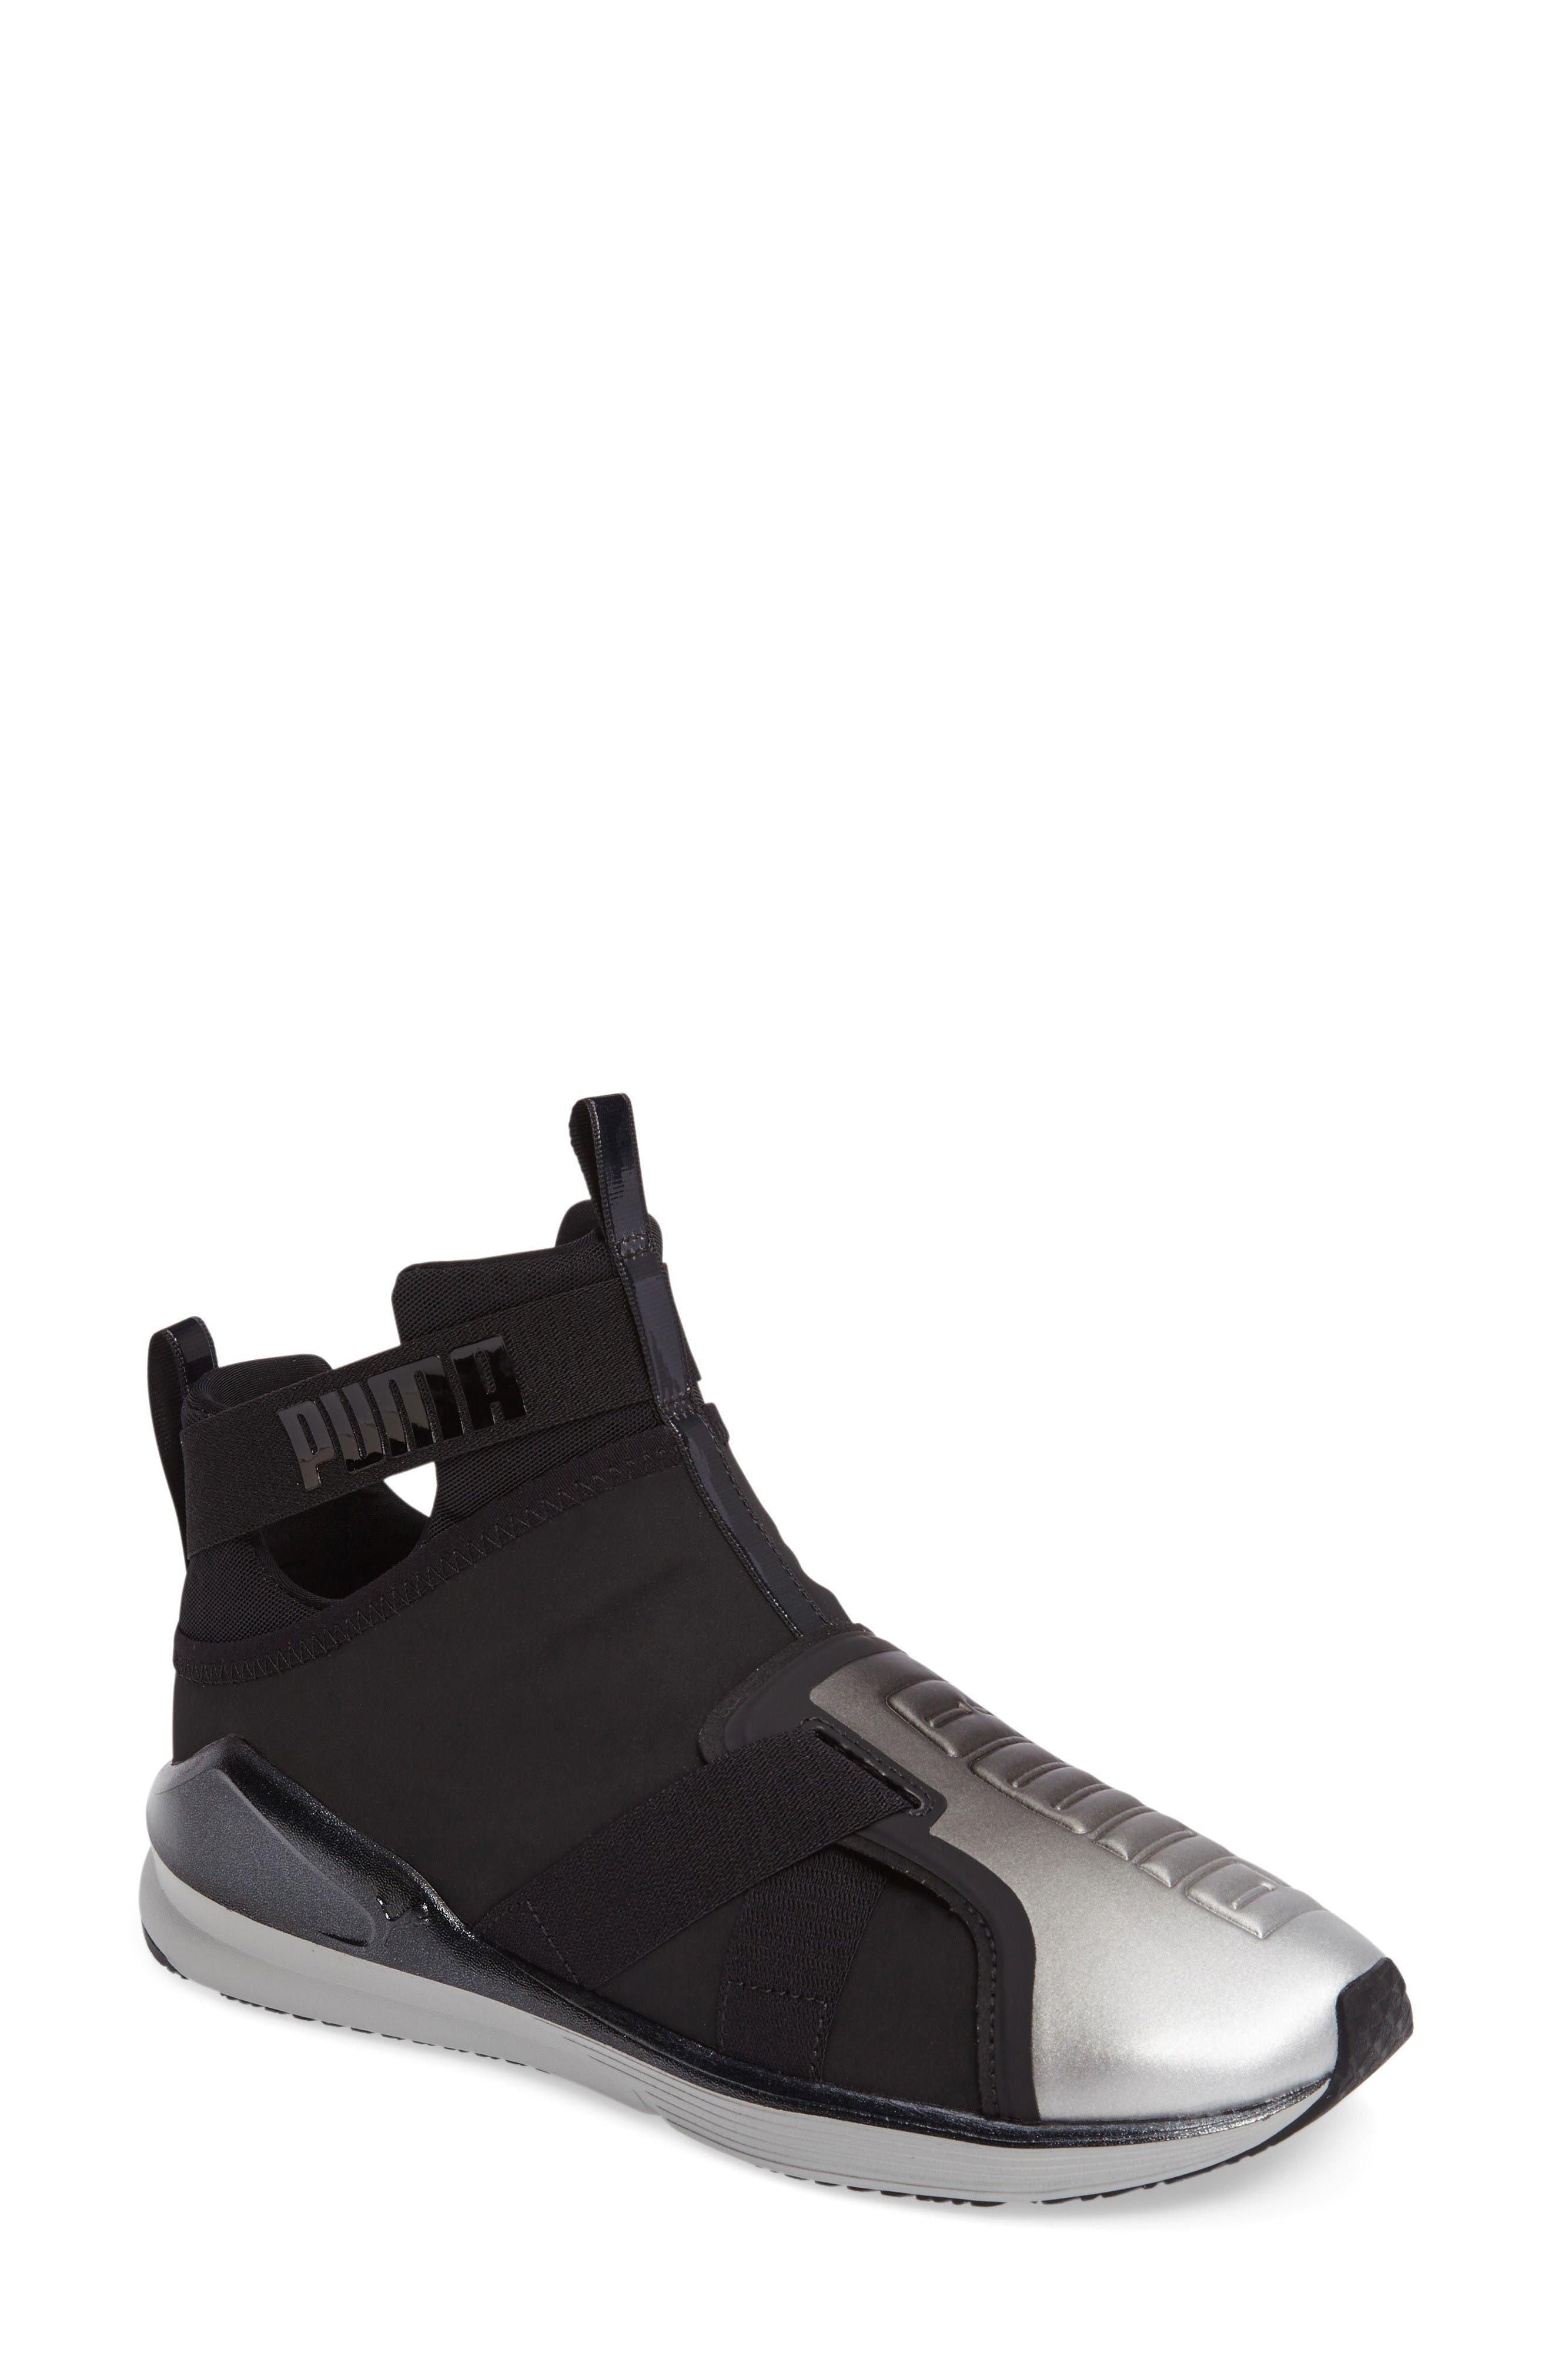 Alternate Image 1 Selected - PUMA Fierce High Top Sneaker (Women)